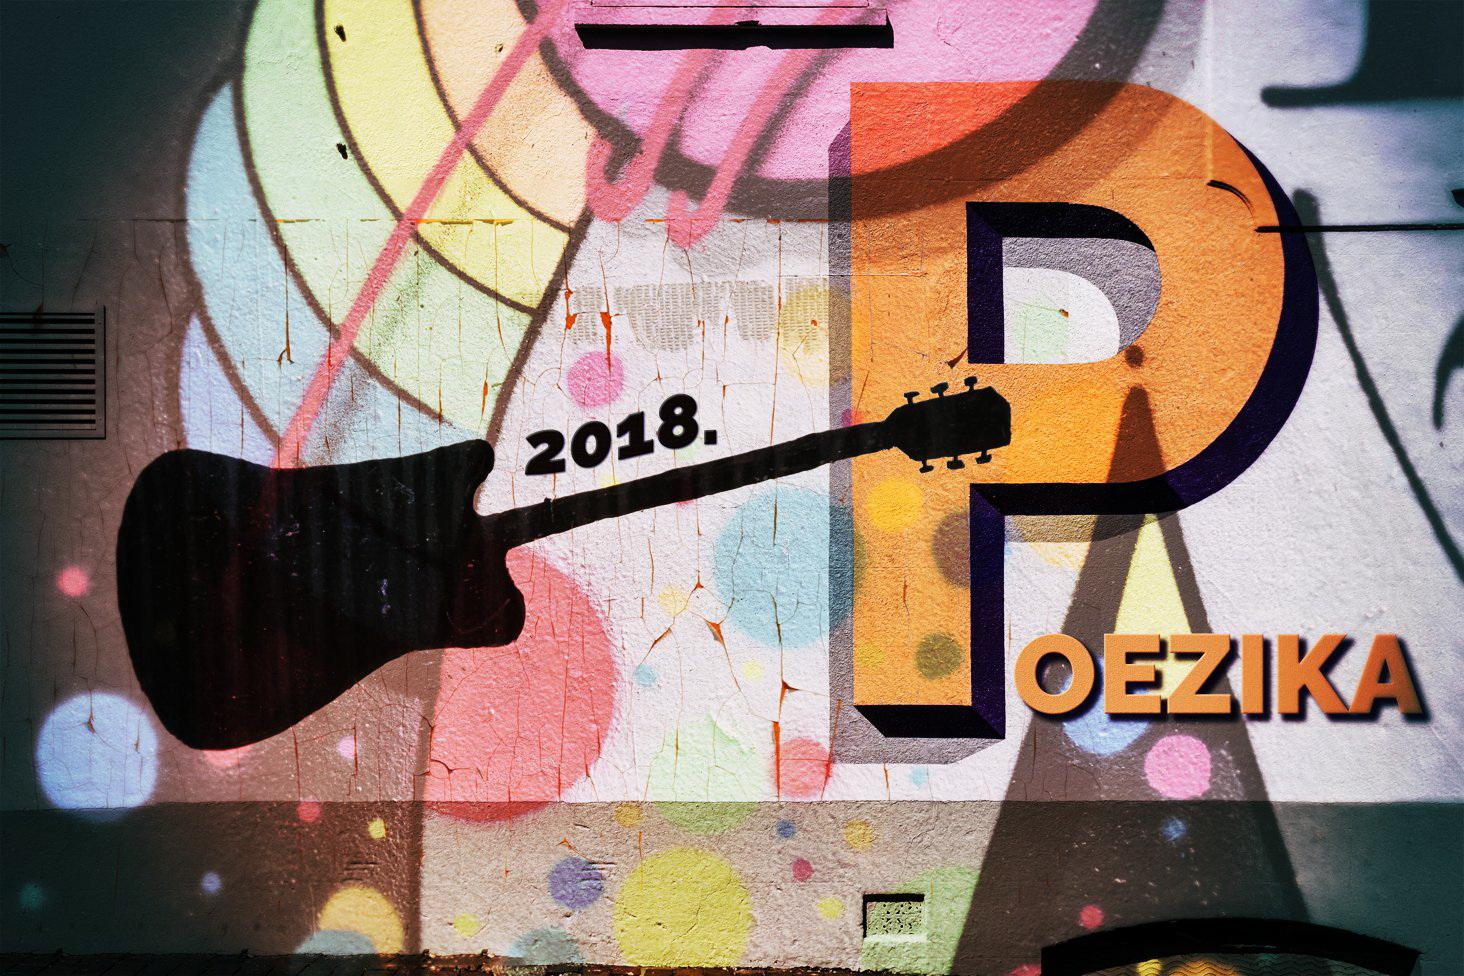 Konkurs za kantautore iz regiona ‒ festival Poezika 2018.